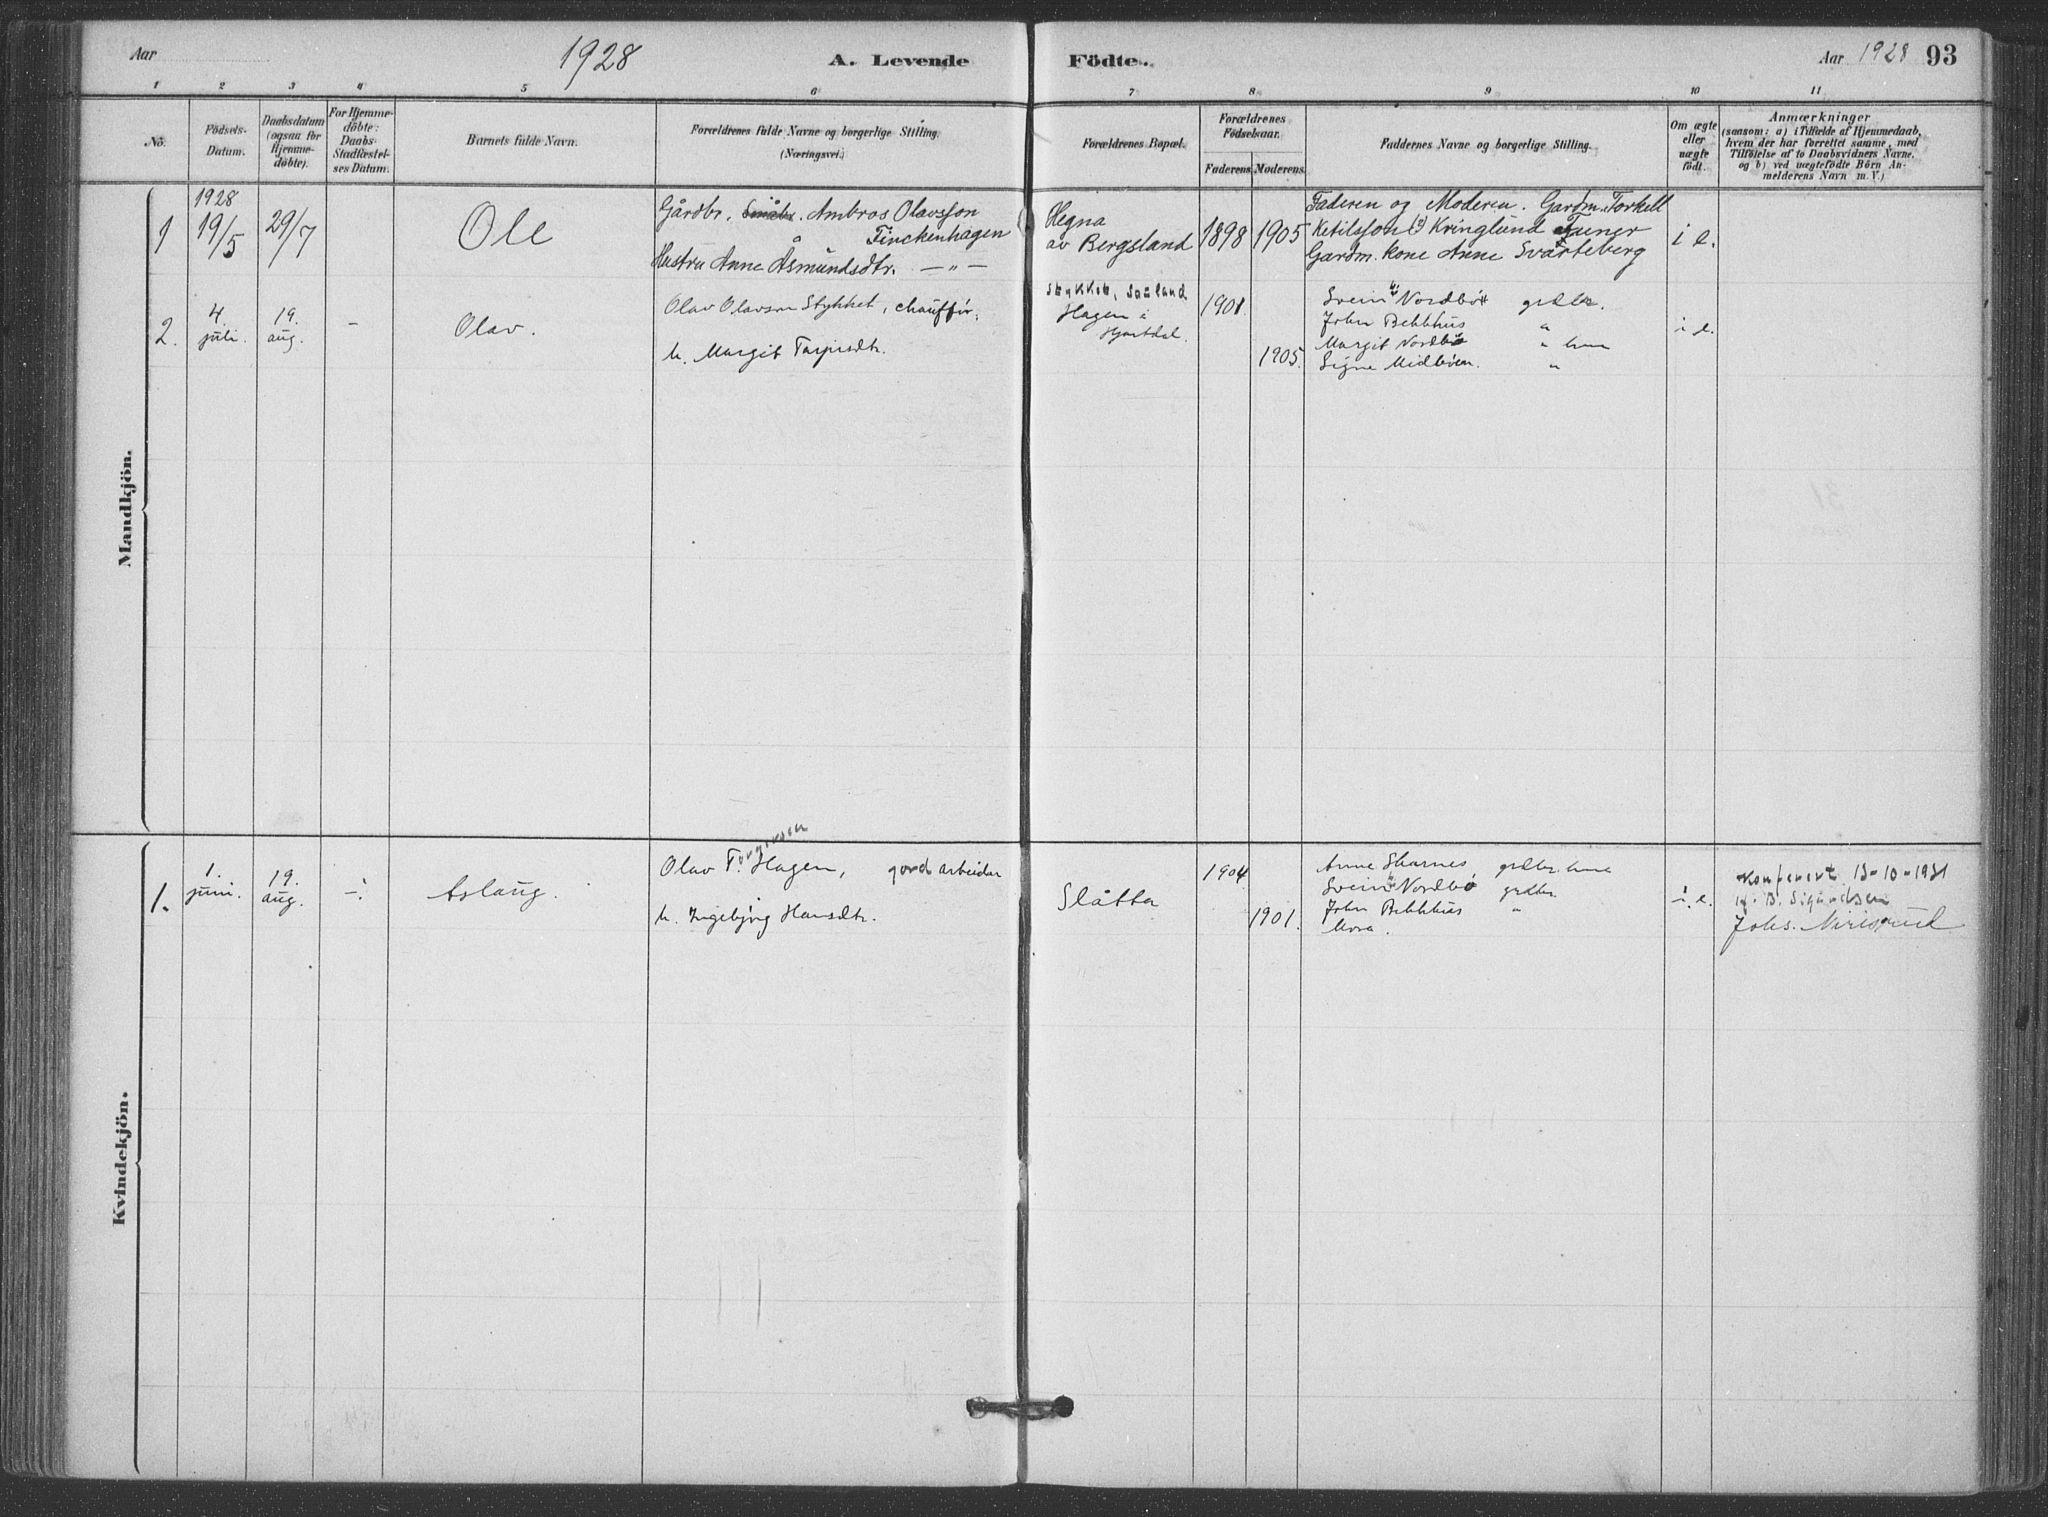 SAKO, Hjartdal kirkebøker, F/Fa/L0010: Ministerialbok nr. I 10, 1880-1929, s. 93